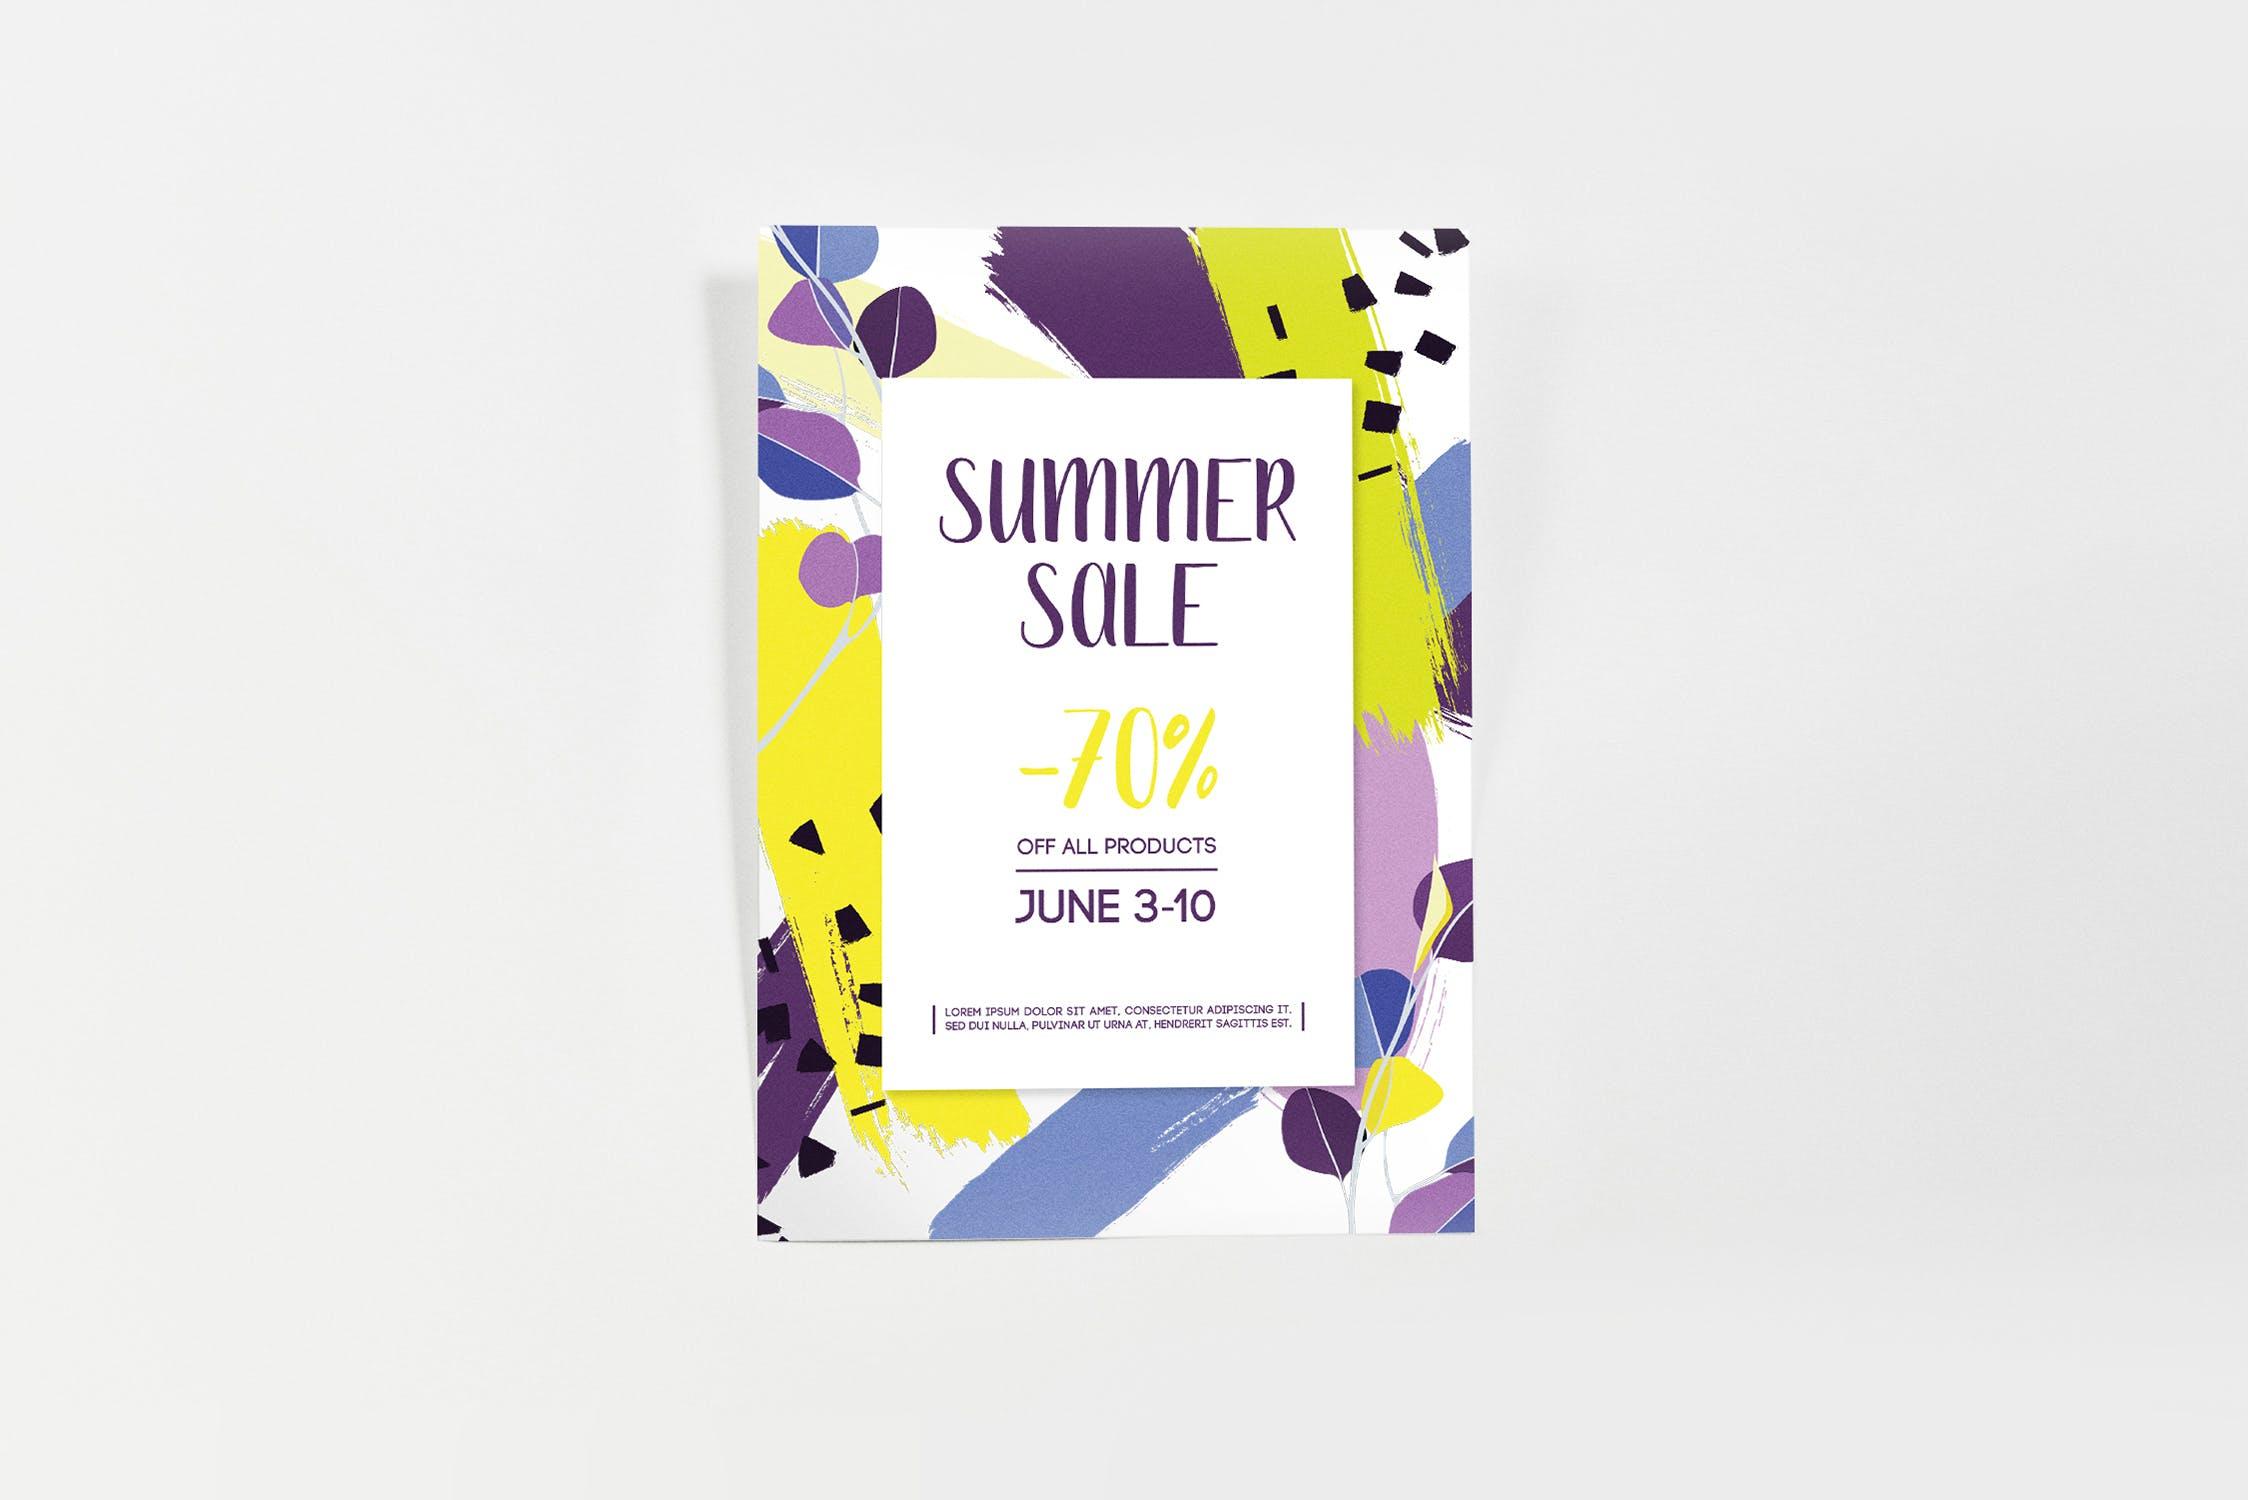 涂鸦纹理夏季海报模板Summer Sale Poster Template